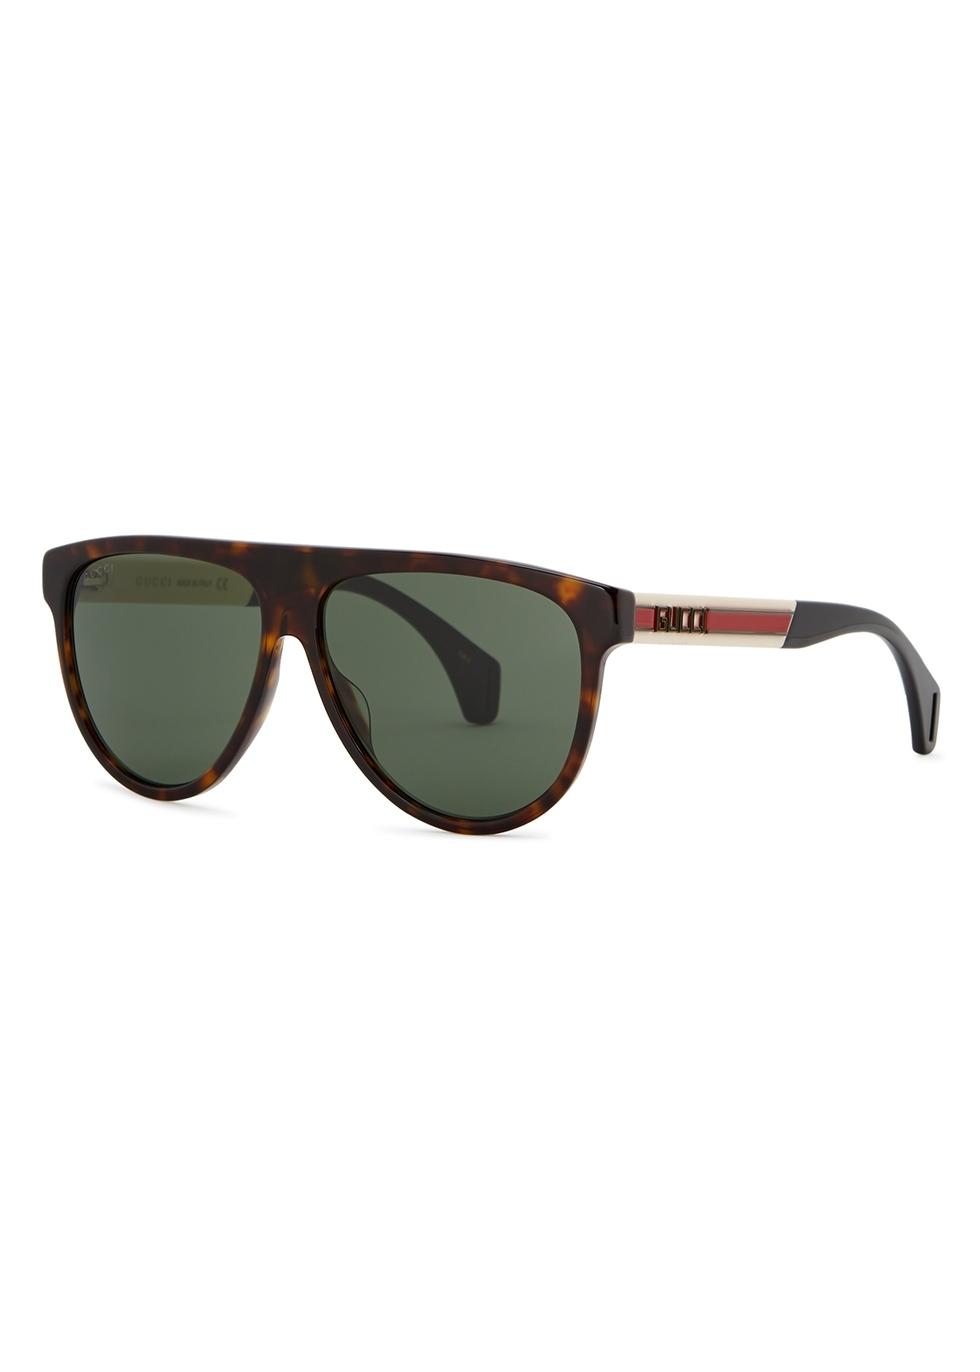 ff9fa0d126 Men s Designer Sunglasses   Eyewear - Harvey Nichols